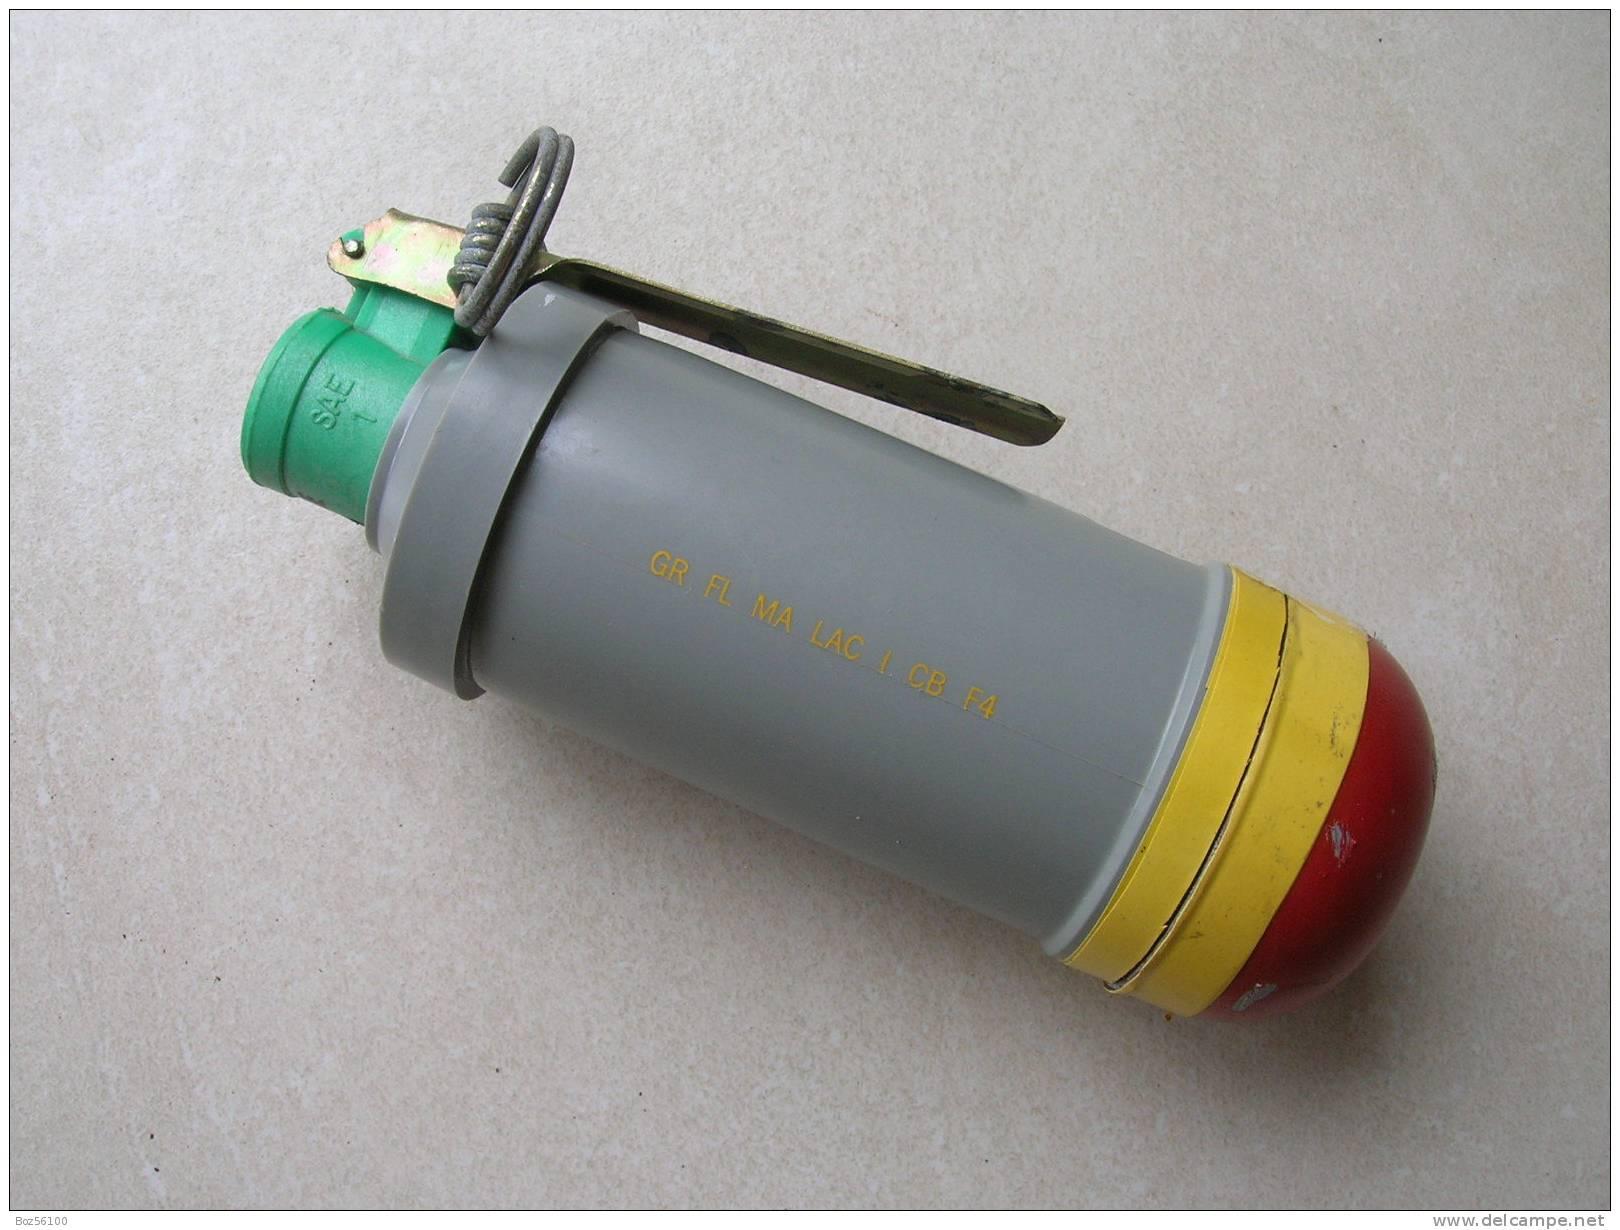 Grenade Lacrymogène Francaise (inerte) - Armes Neutralisées